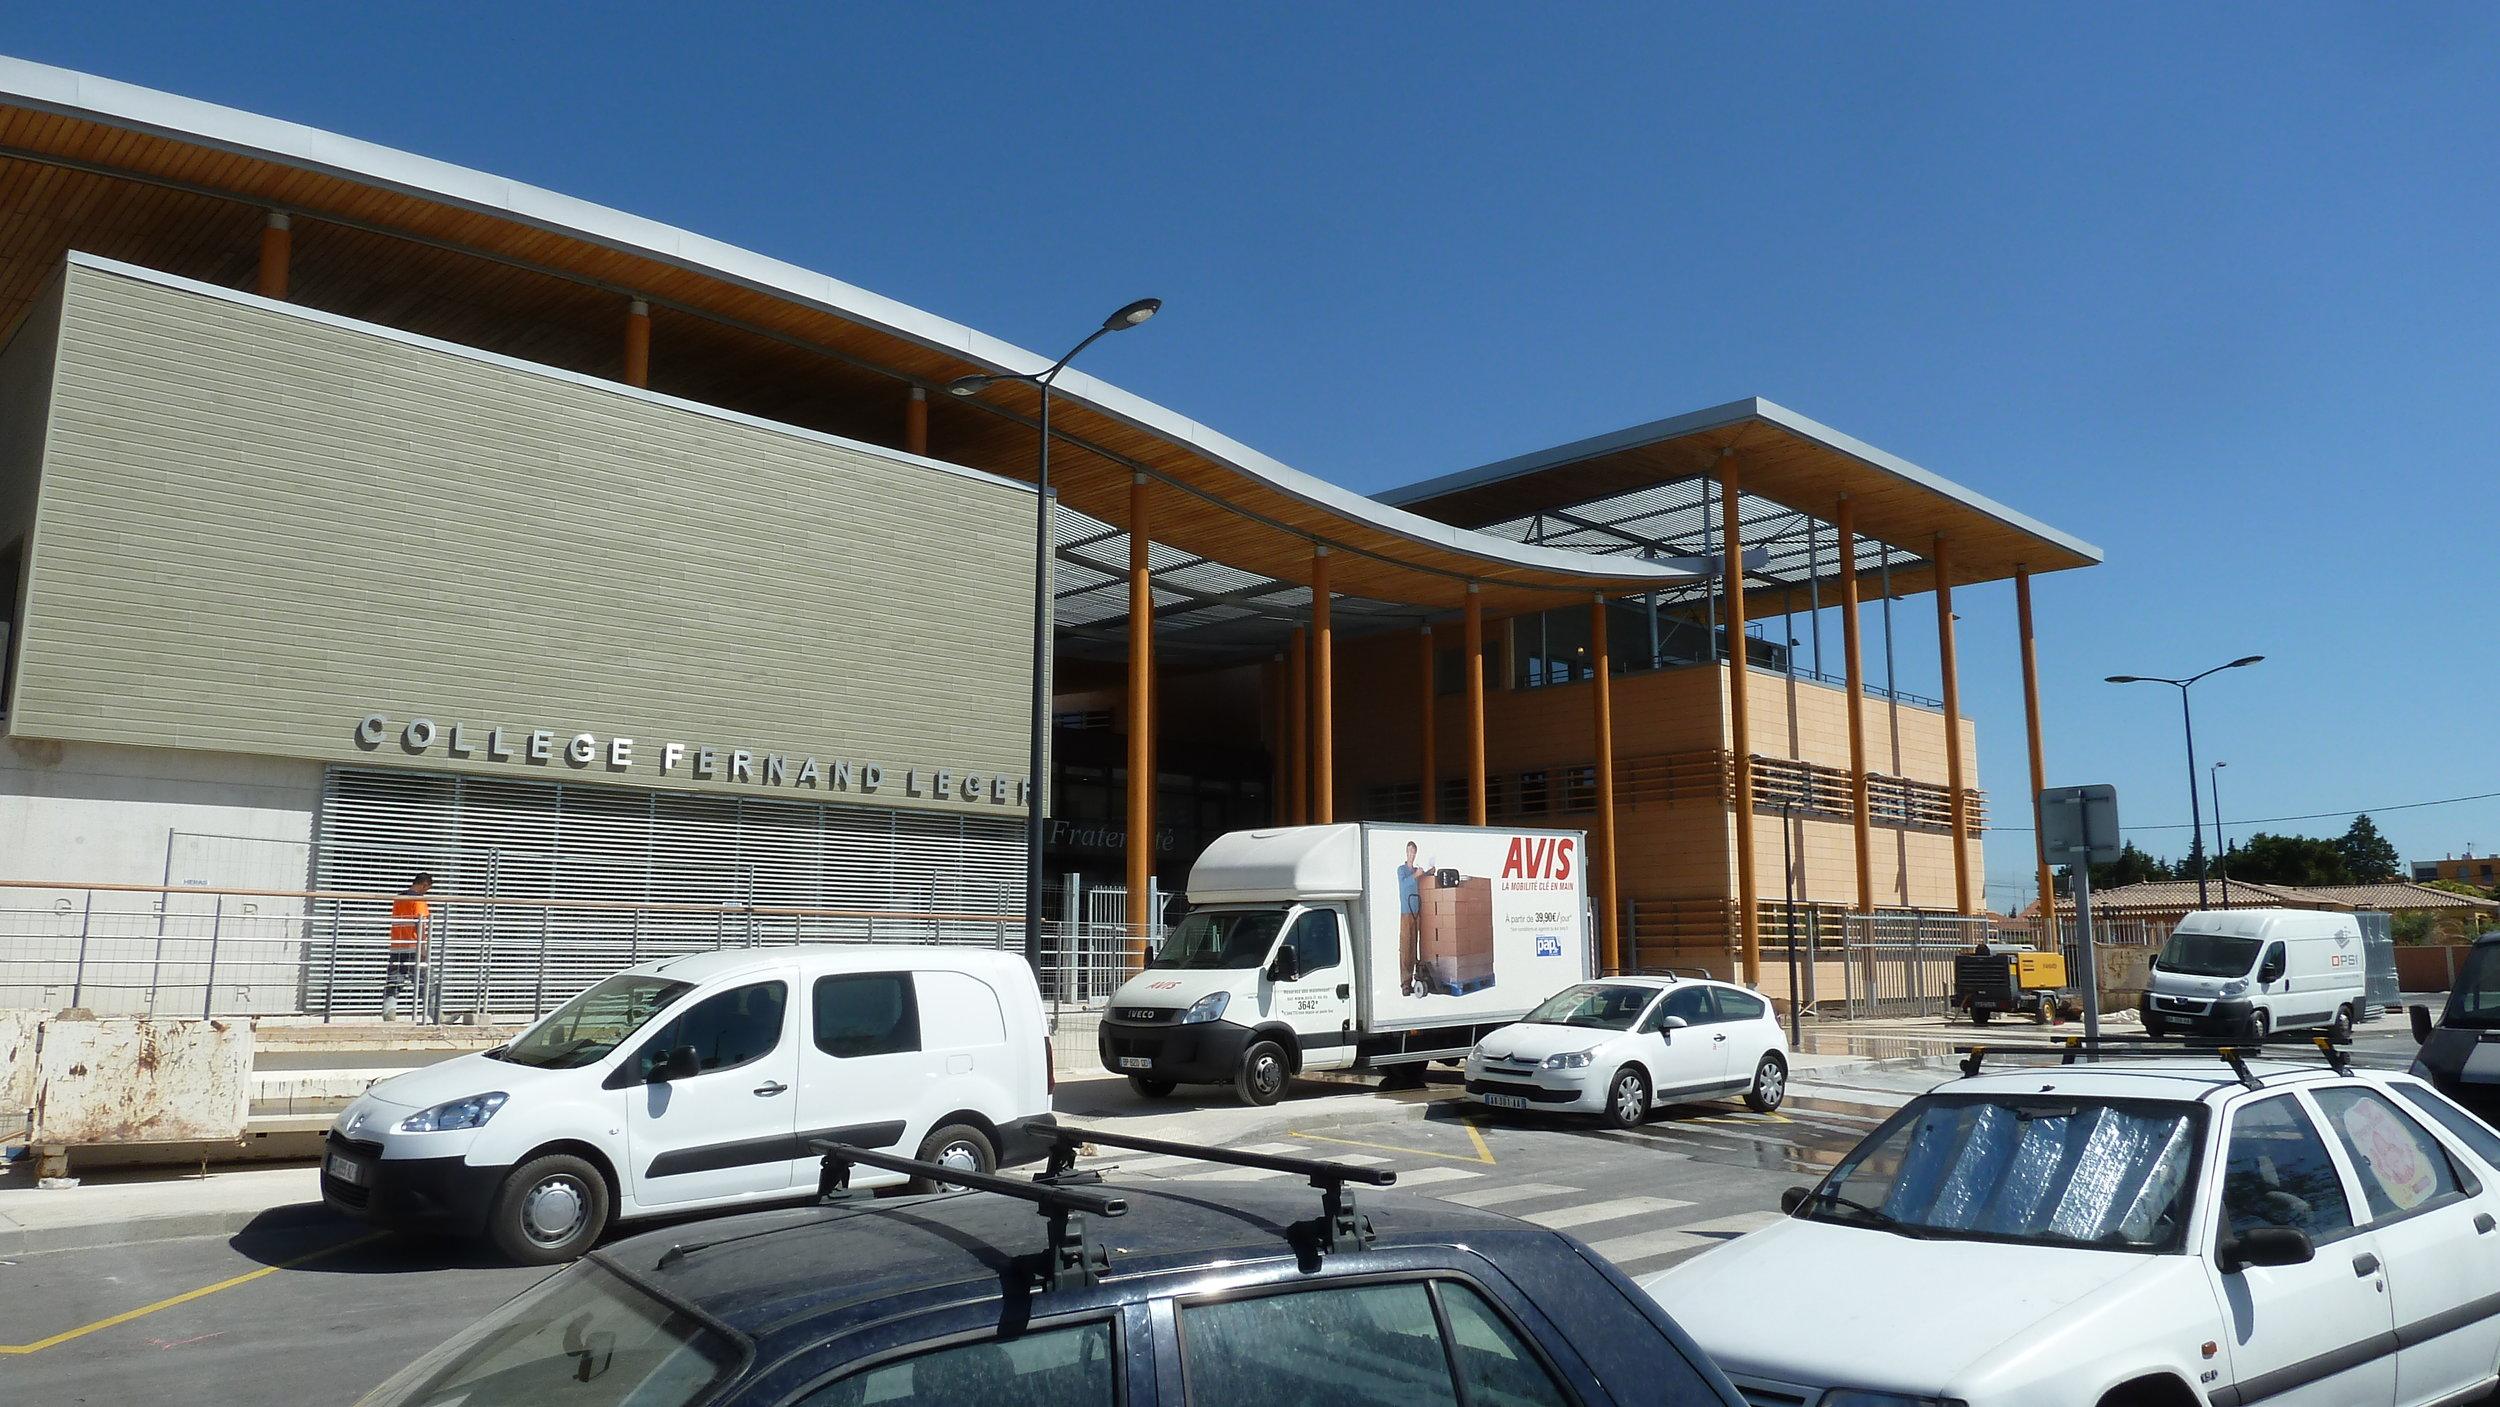 Collège_Fernand_Léger_3.JPG